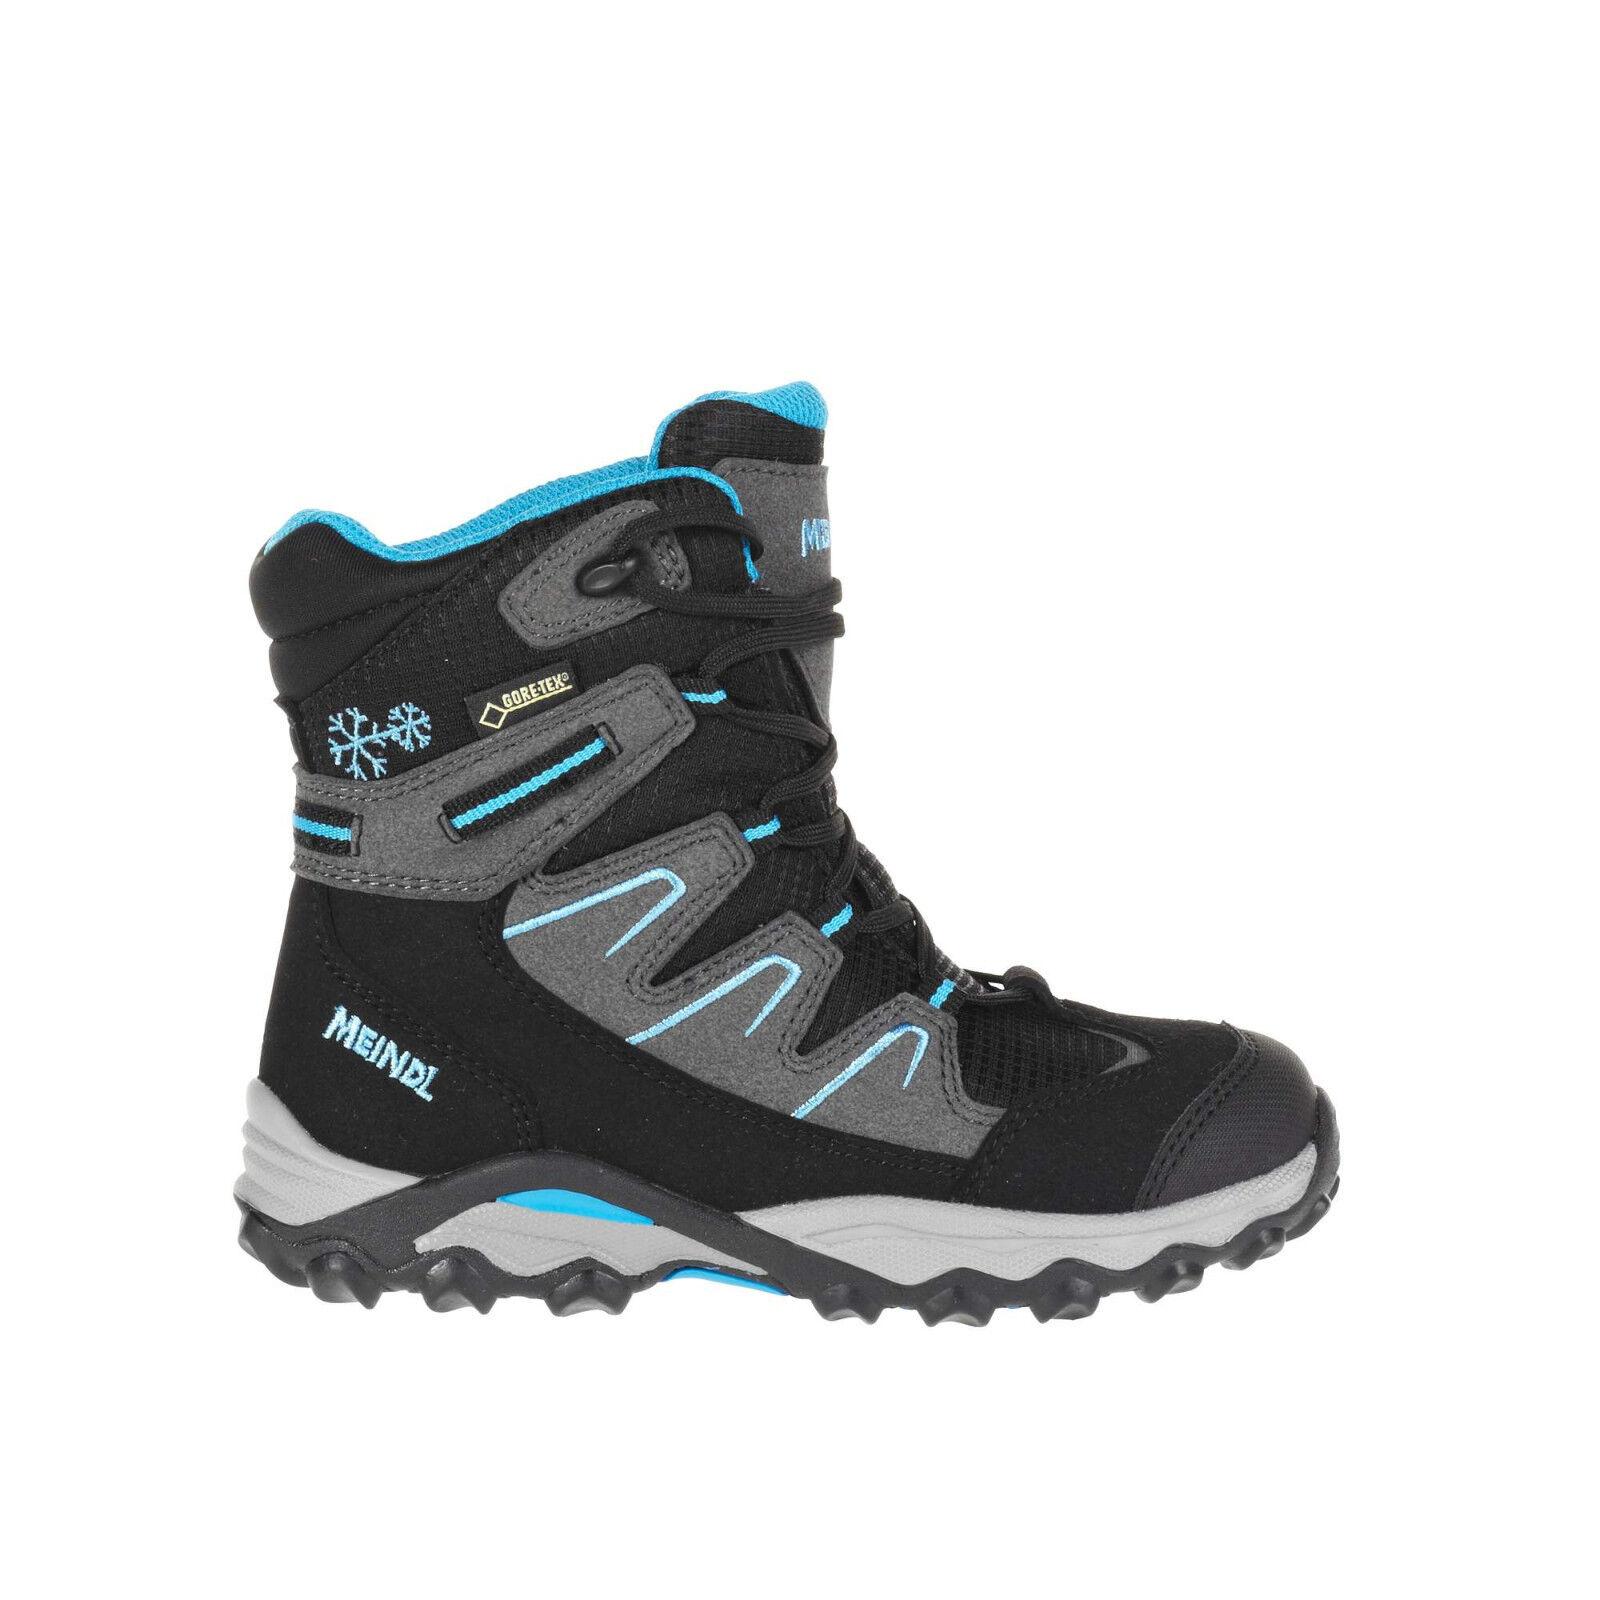 Meindl Kinder Winter Schuhe, Winterschuhe INTER STORM JUNIOR GTX  35 wasserdicht